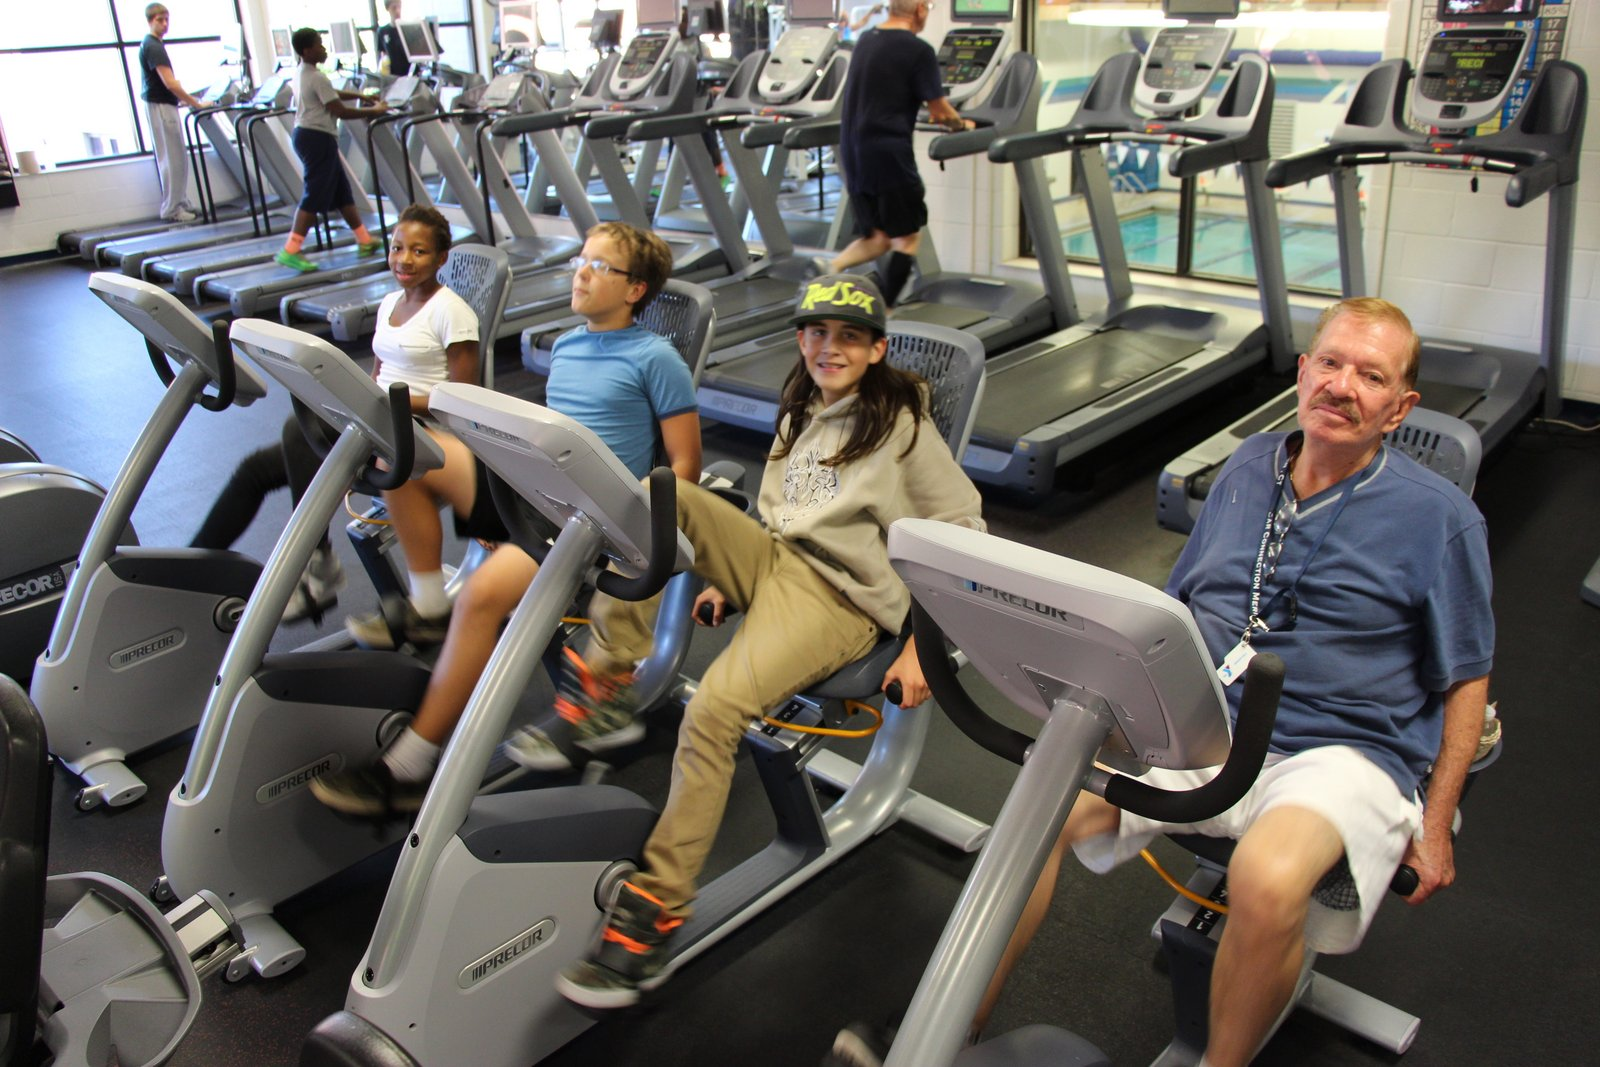 Cardio/Weight Training